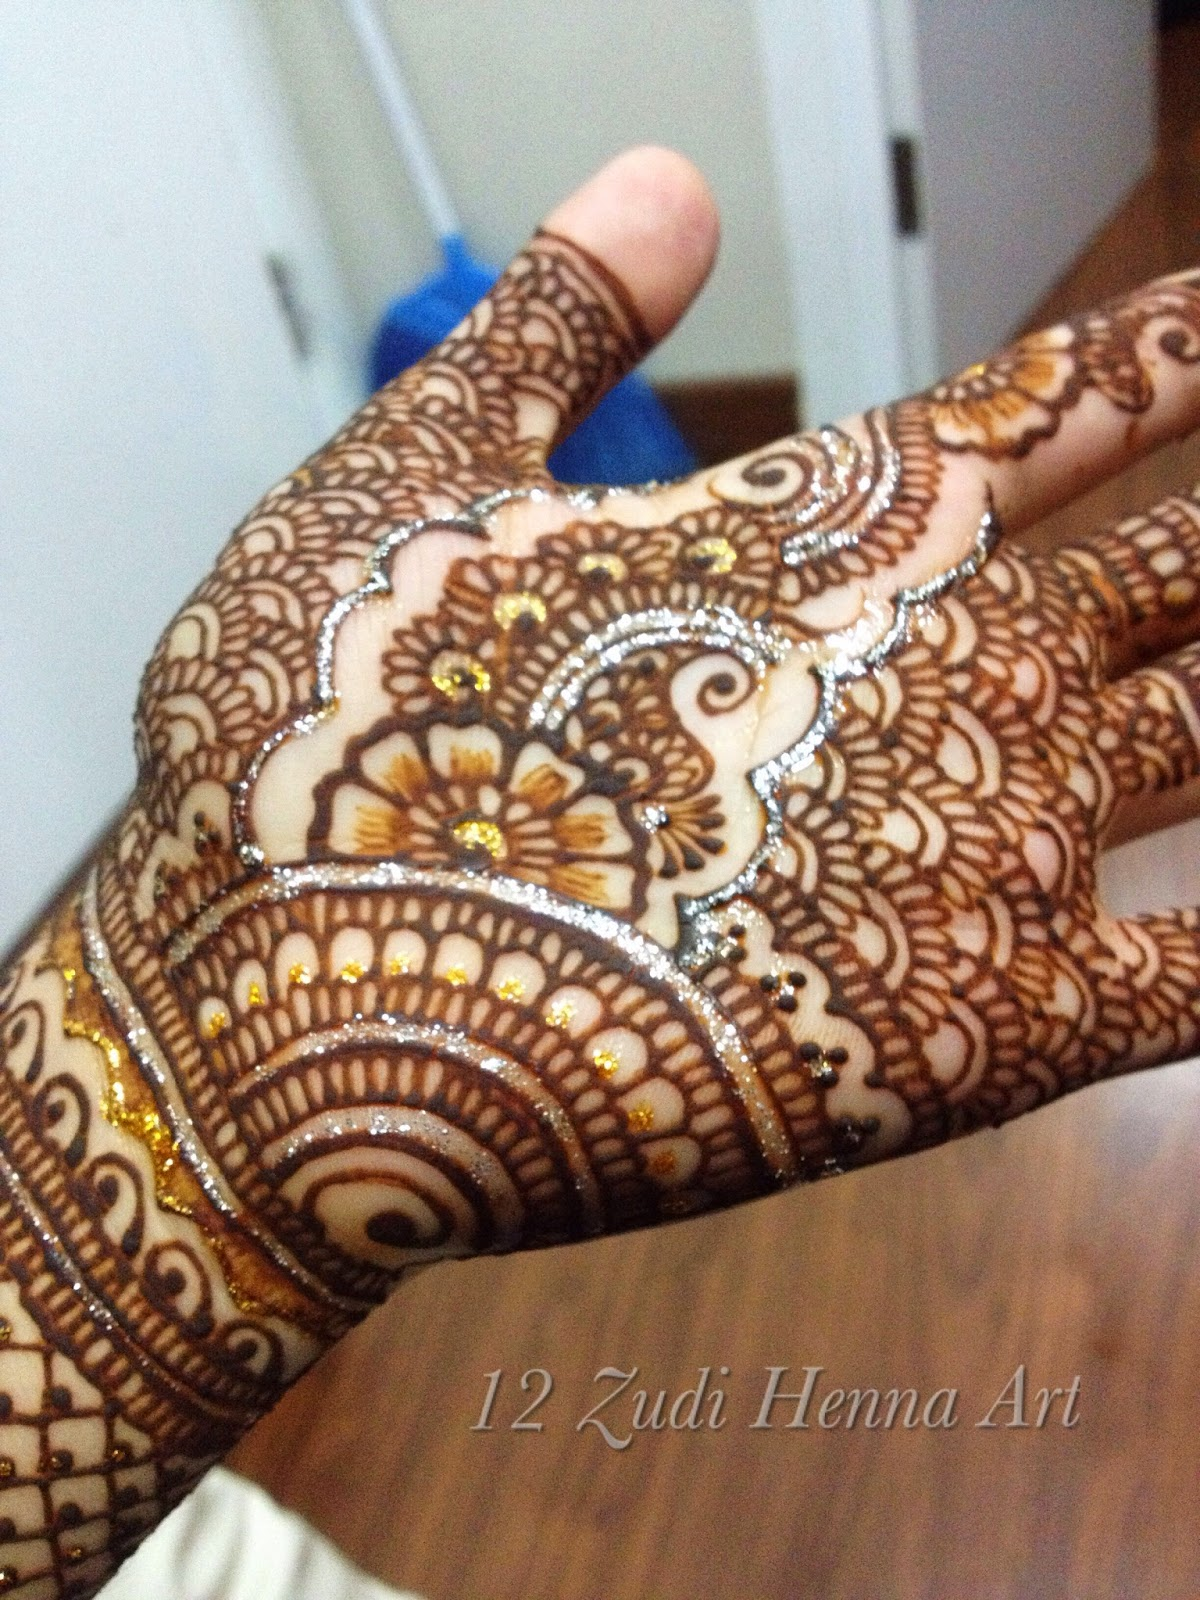 12 Zudi Henna Art Filosofi Henna Dalam Tradisi Masyarakat Dari